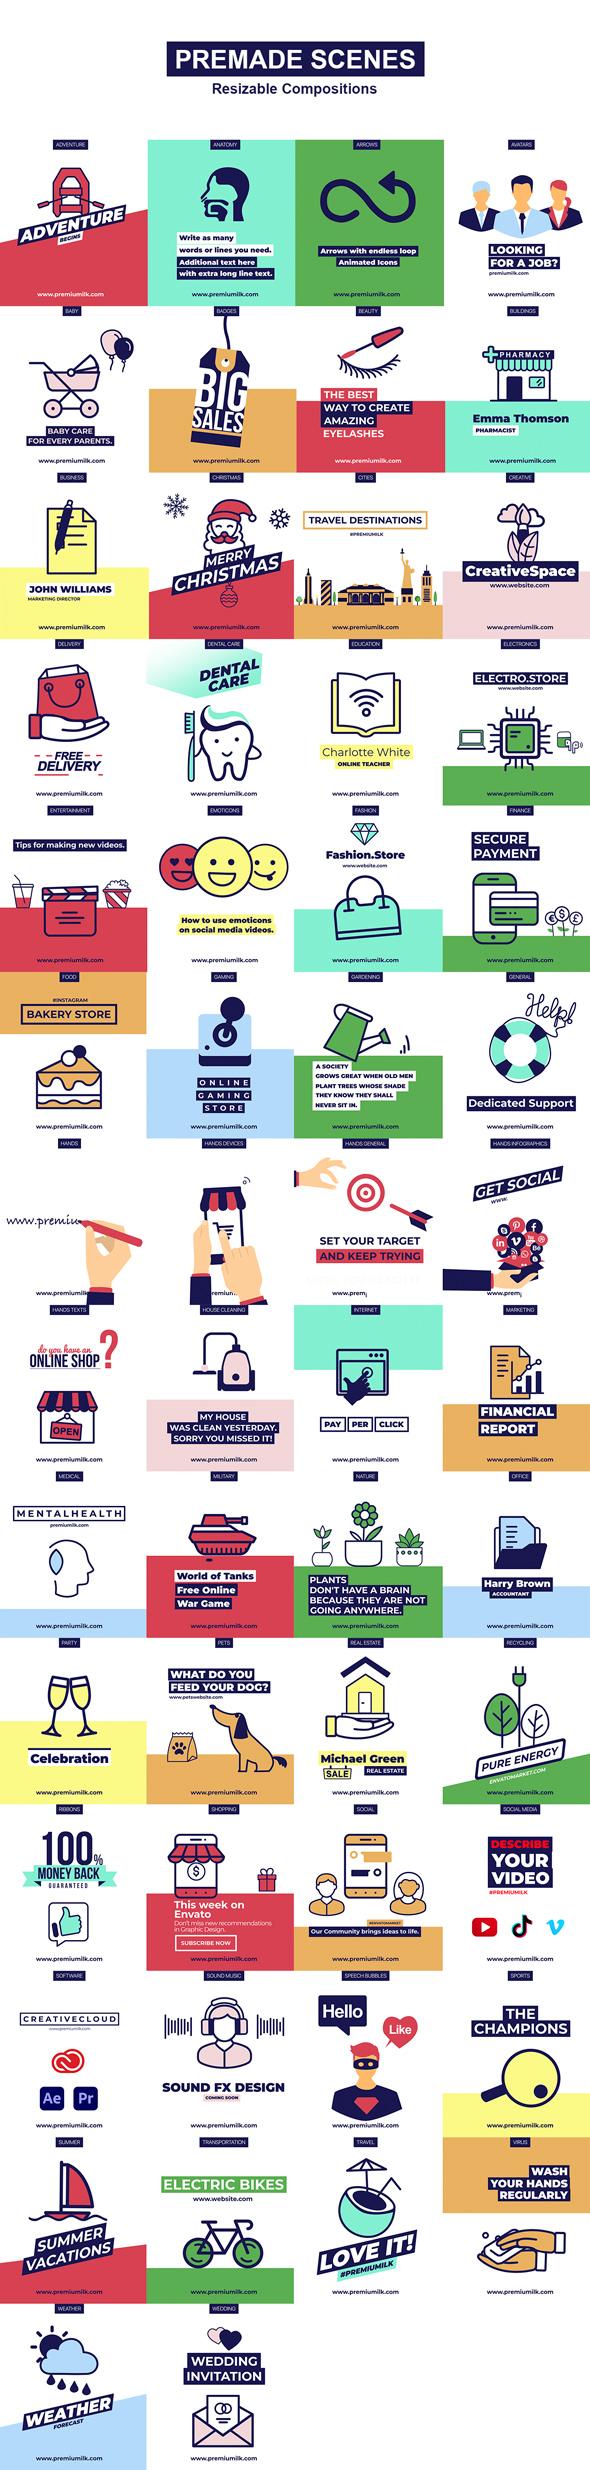 AE脚本-PremiumBuilder Animated Icons 1000个电子商务社交媒体扁平化金融建筑教育医疗儿童表情符号图标动画大合集更新 V3插图8